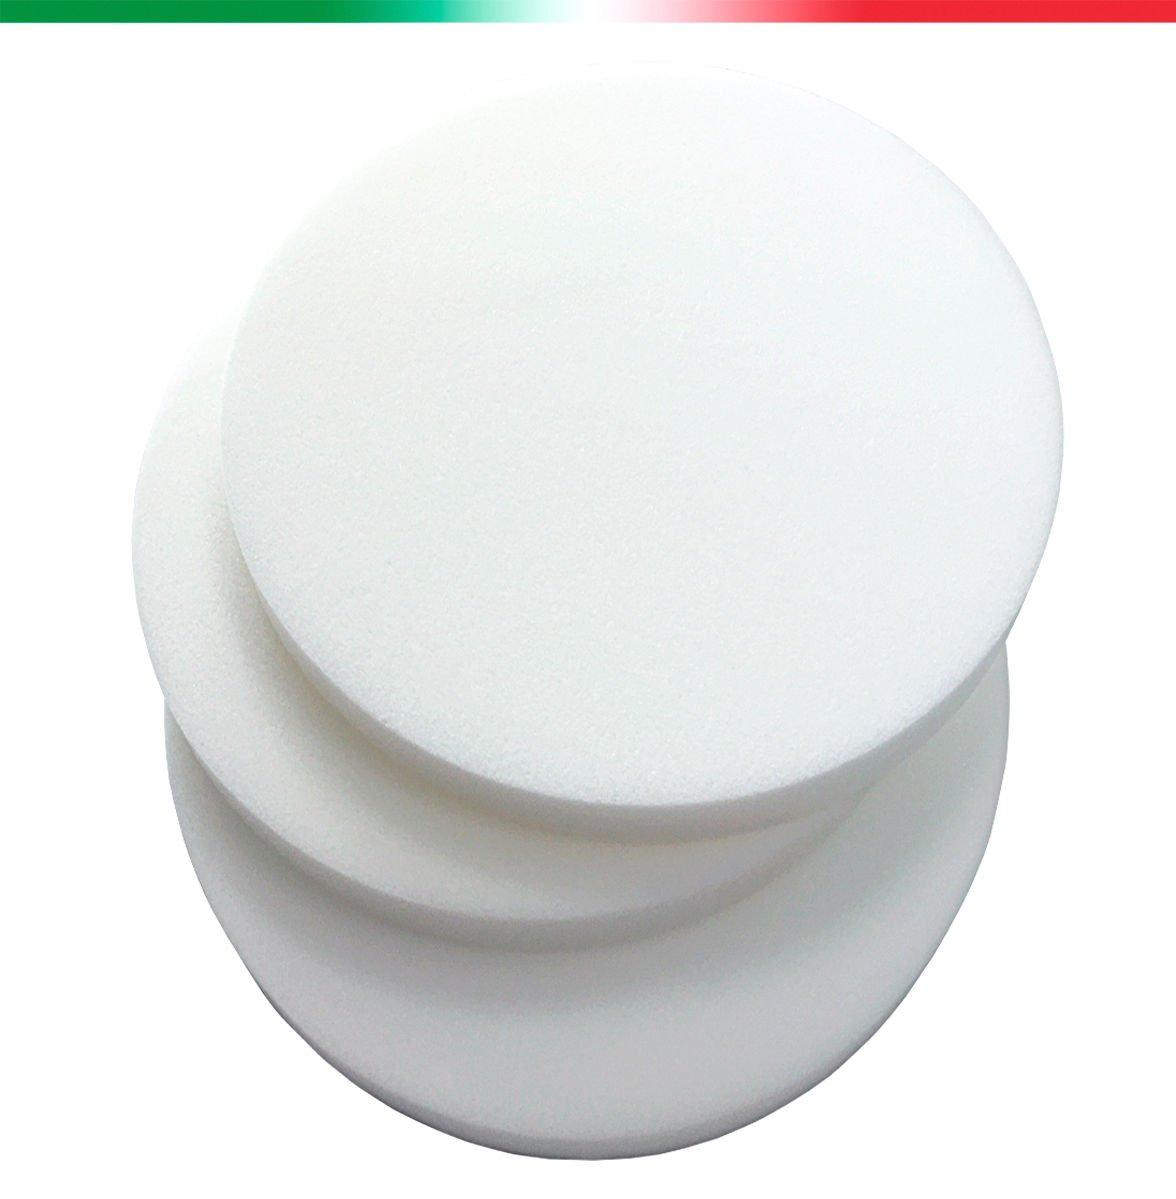 Spugna Gommapiuma Tonda Diametro 41cm Spessore 3 Poliuretano Espanso Imbottiture Alta Densità 25 100% Made In Italy mod.SPUGNA TONDA 41 EMMEVI